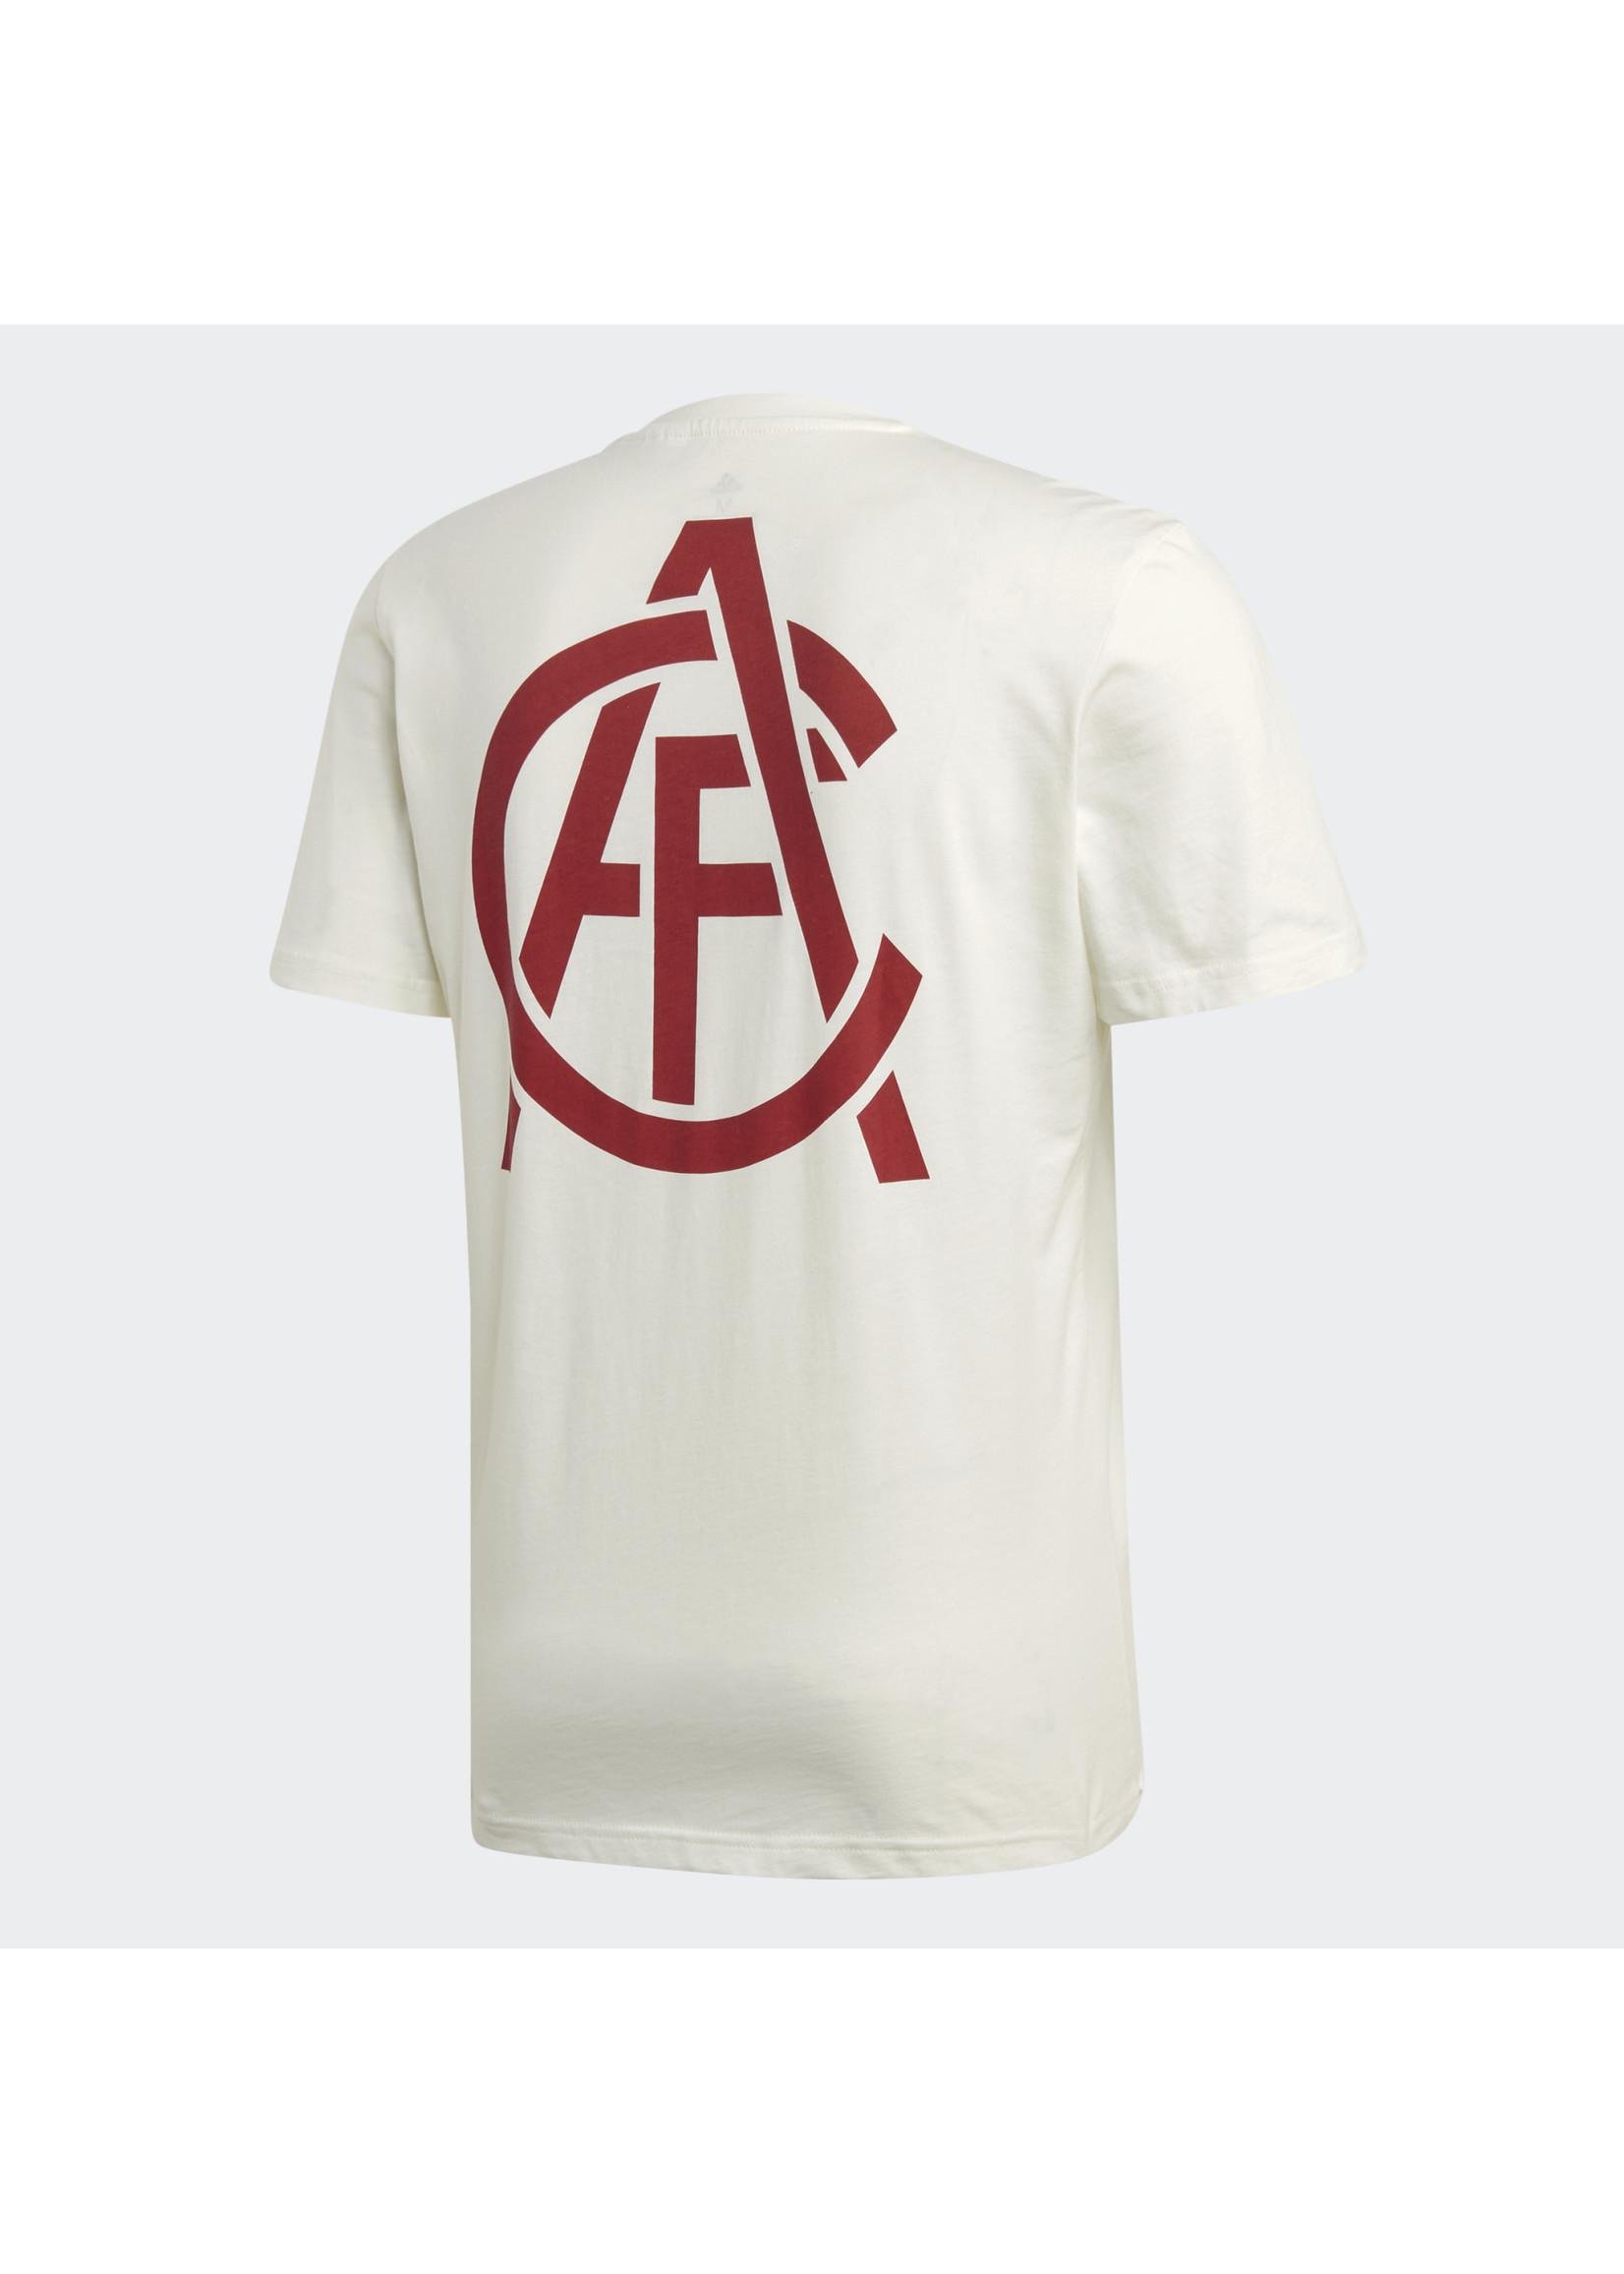 Adidas Arsenal T-Shirt - Street Graphic